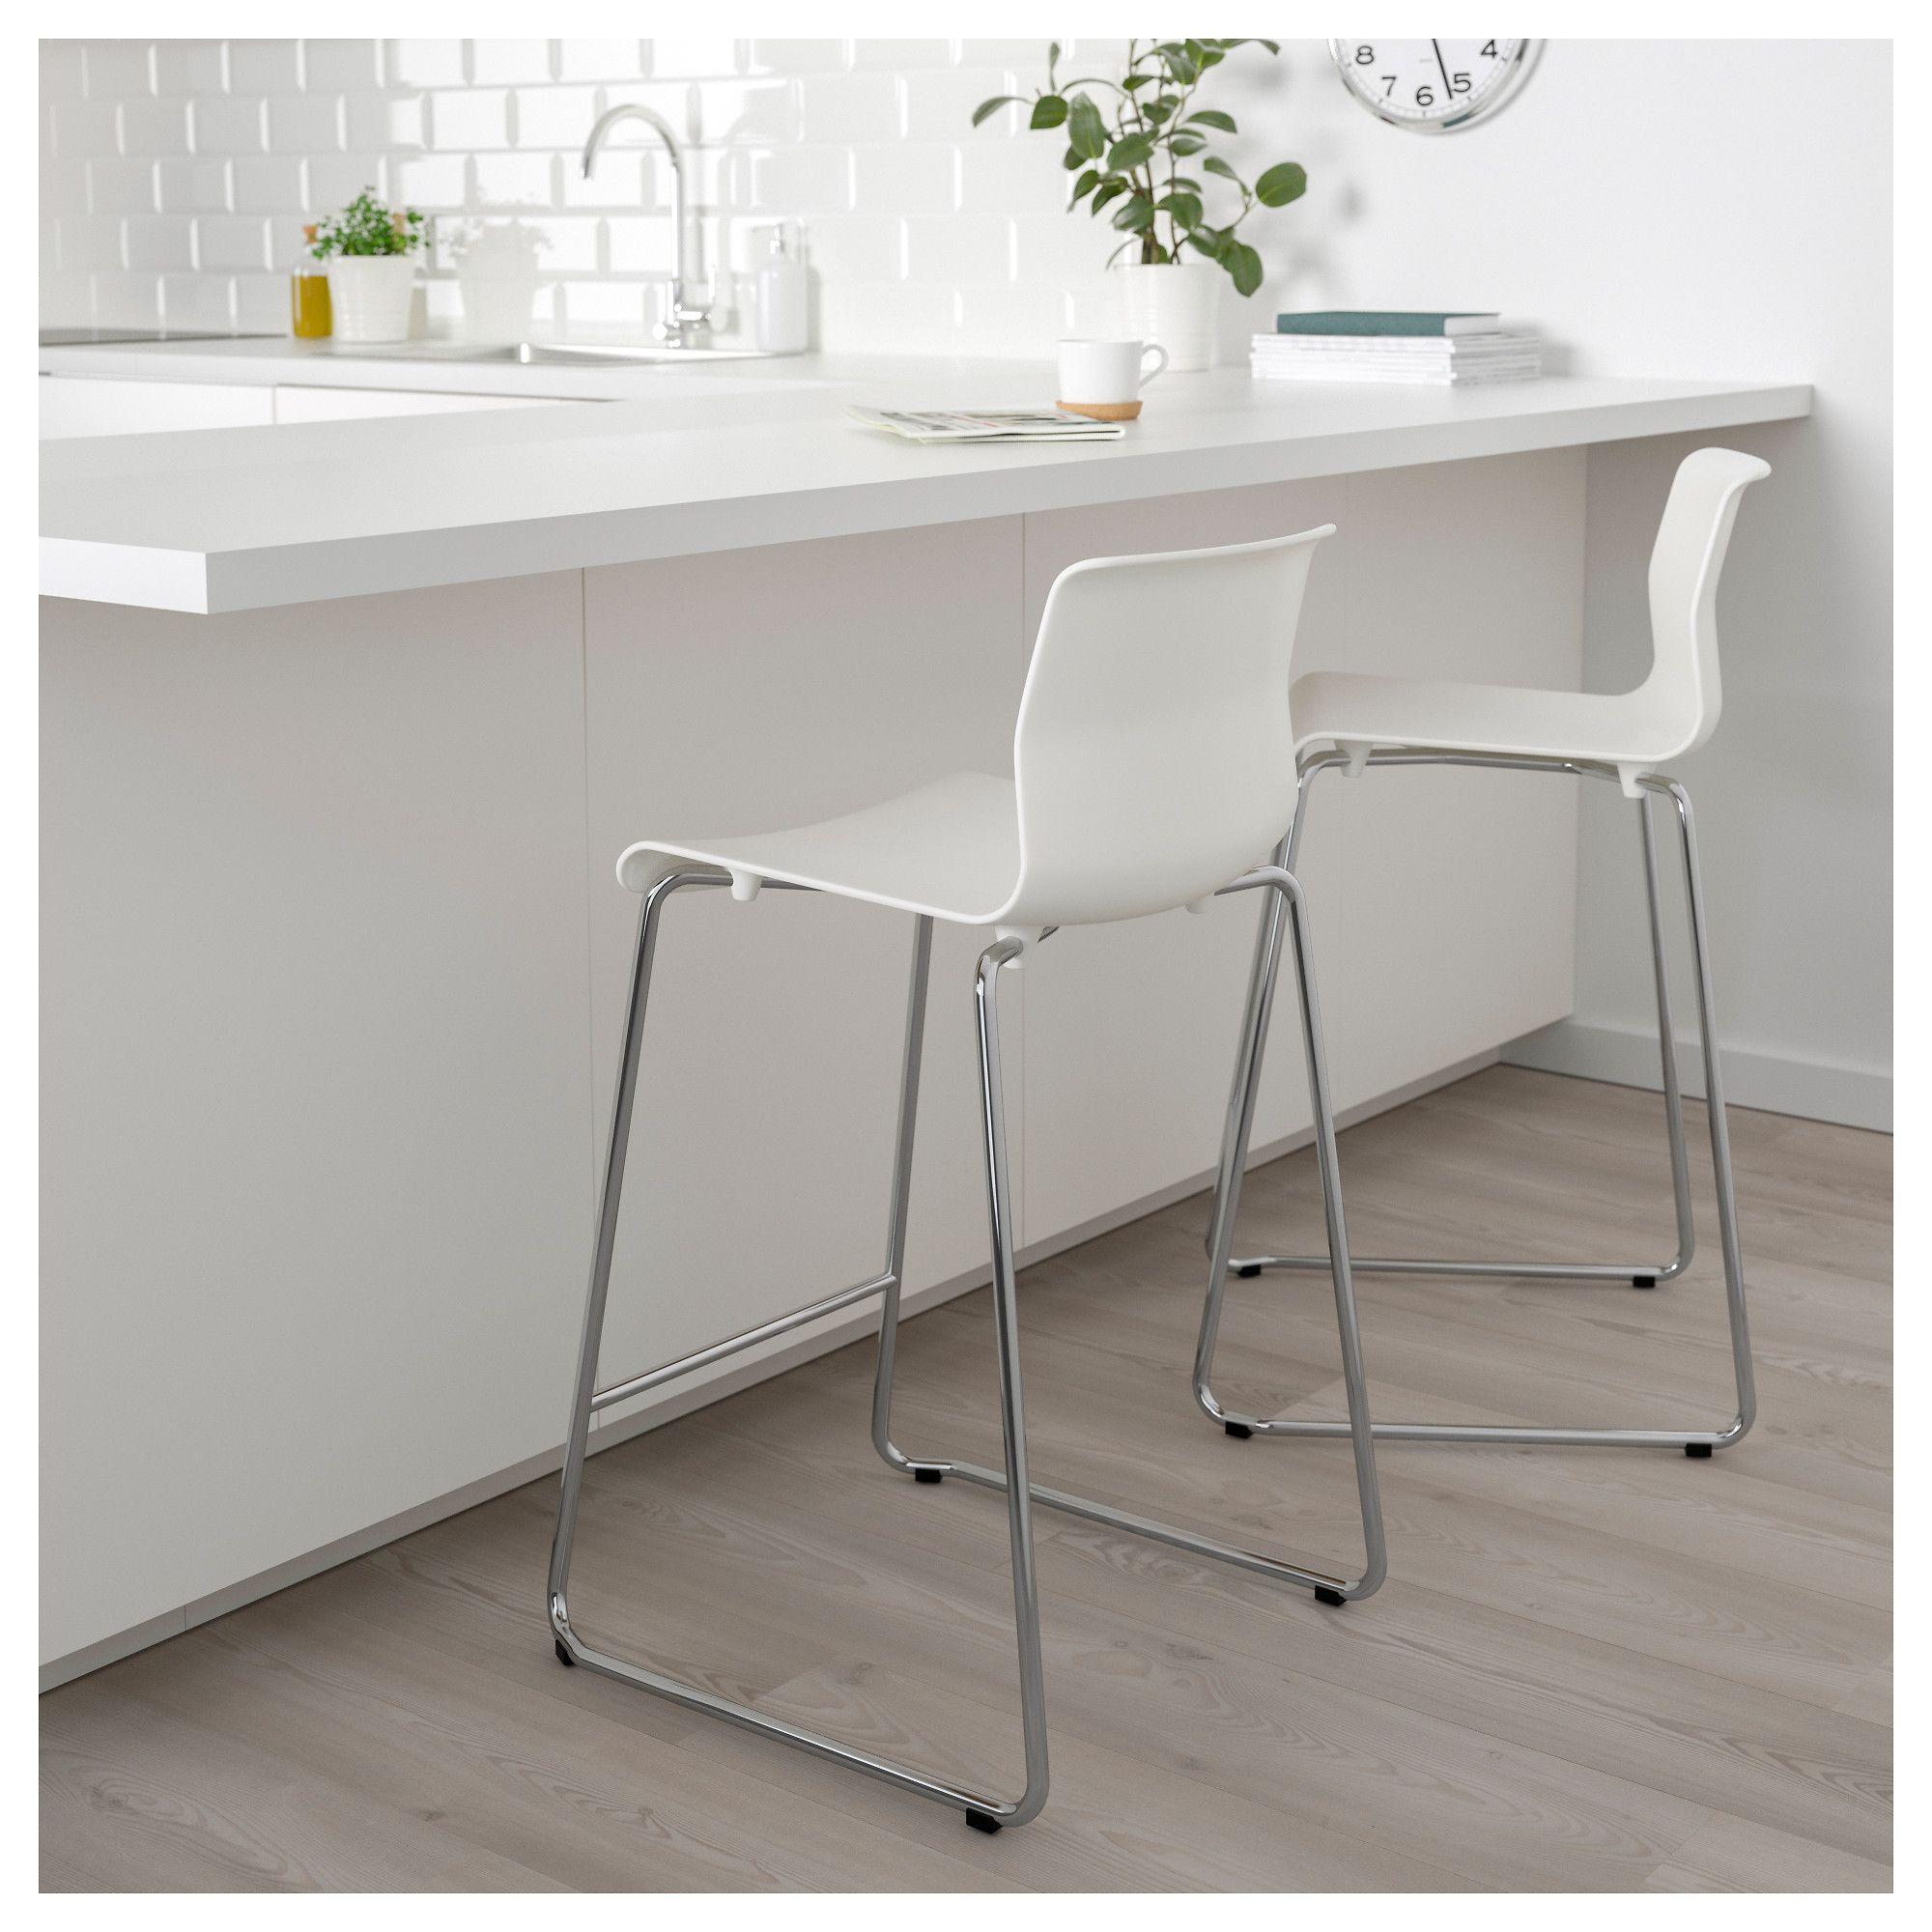 Amazing Ikea Glenn White Chrome Plated Bar Stool White Bar Stools Pdpeps Interior Chair Design Pdpepsorg